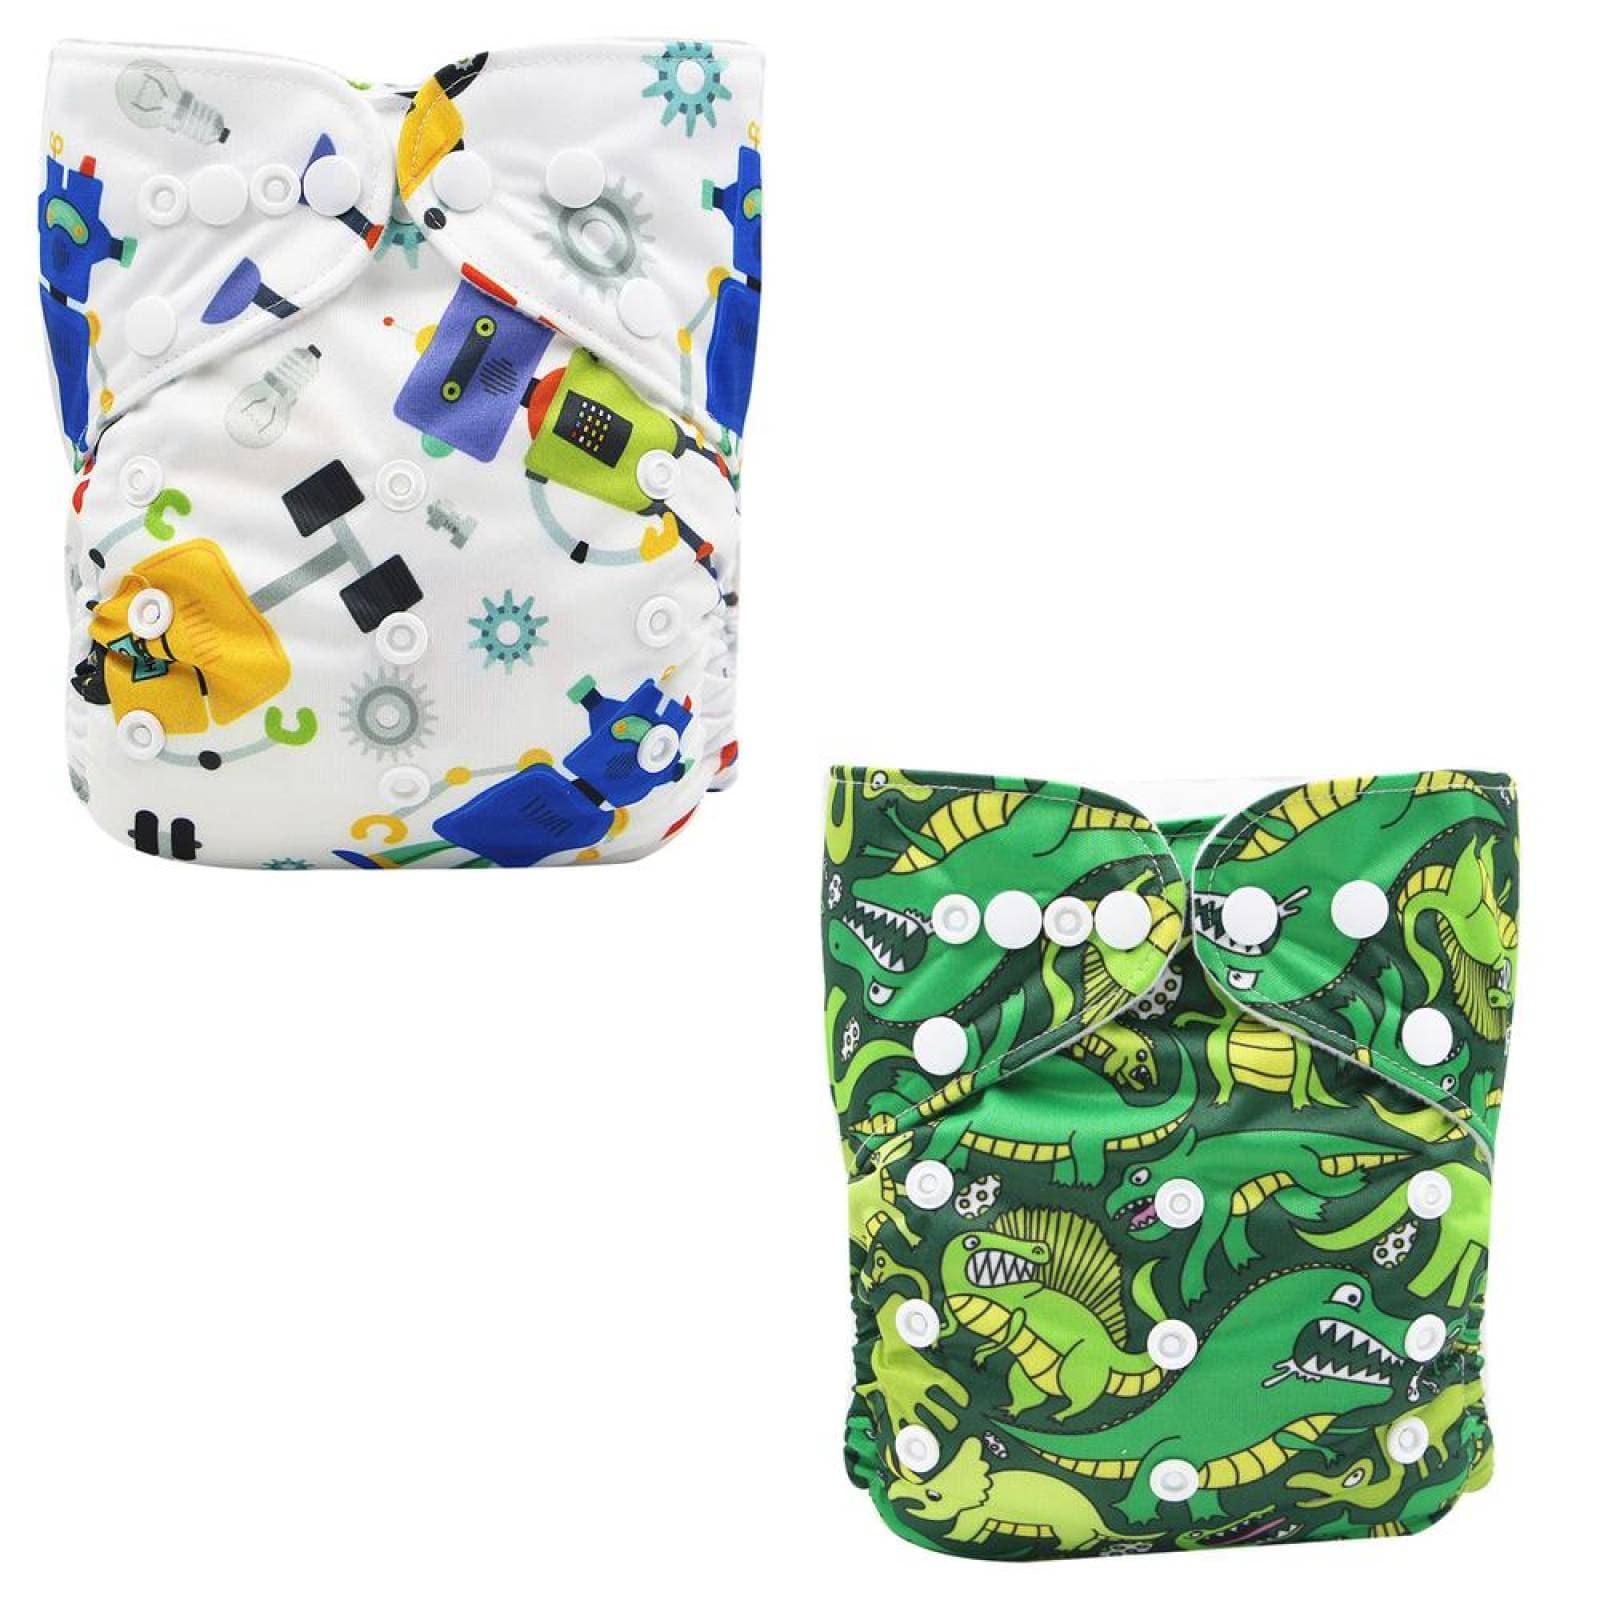 Pañal ecologico de tela reutilizable con Diseños 10 pañales 10 Insertos